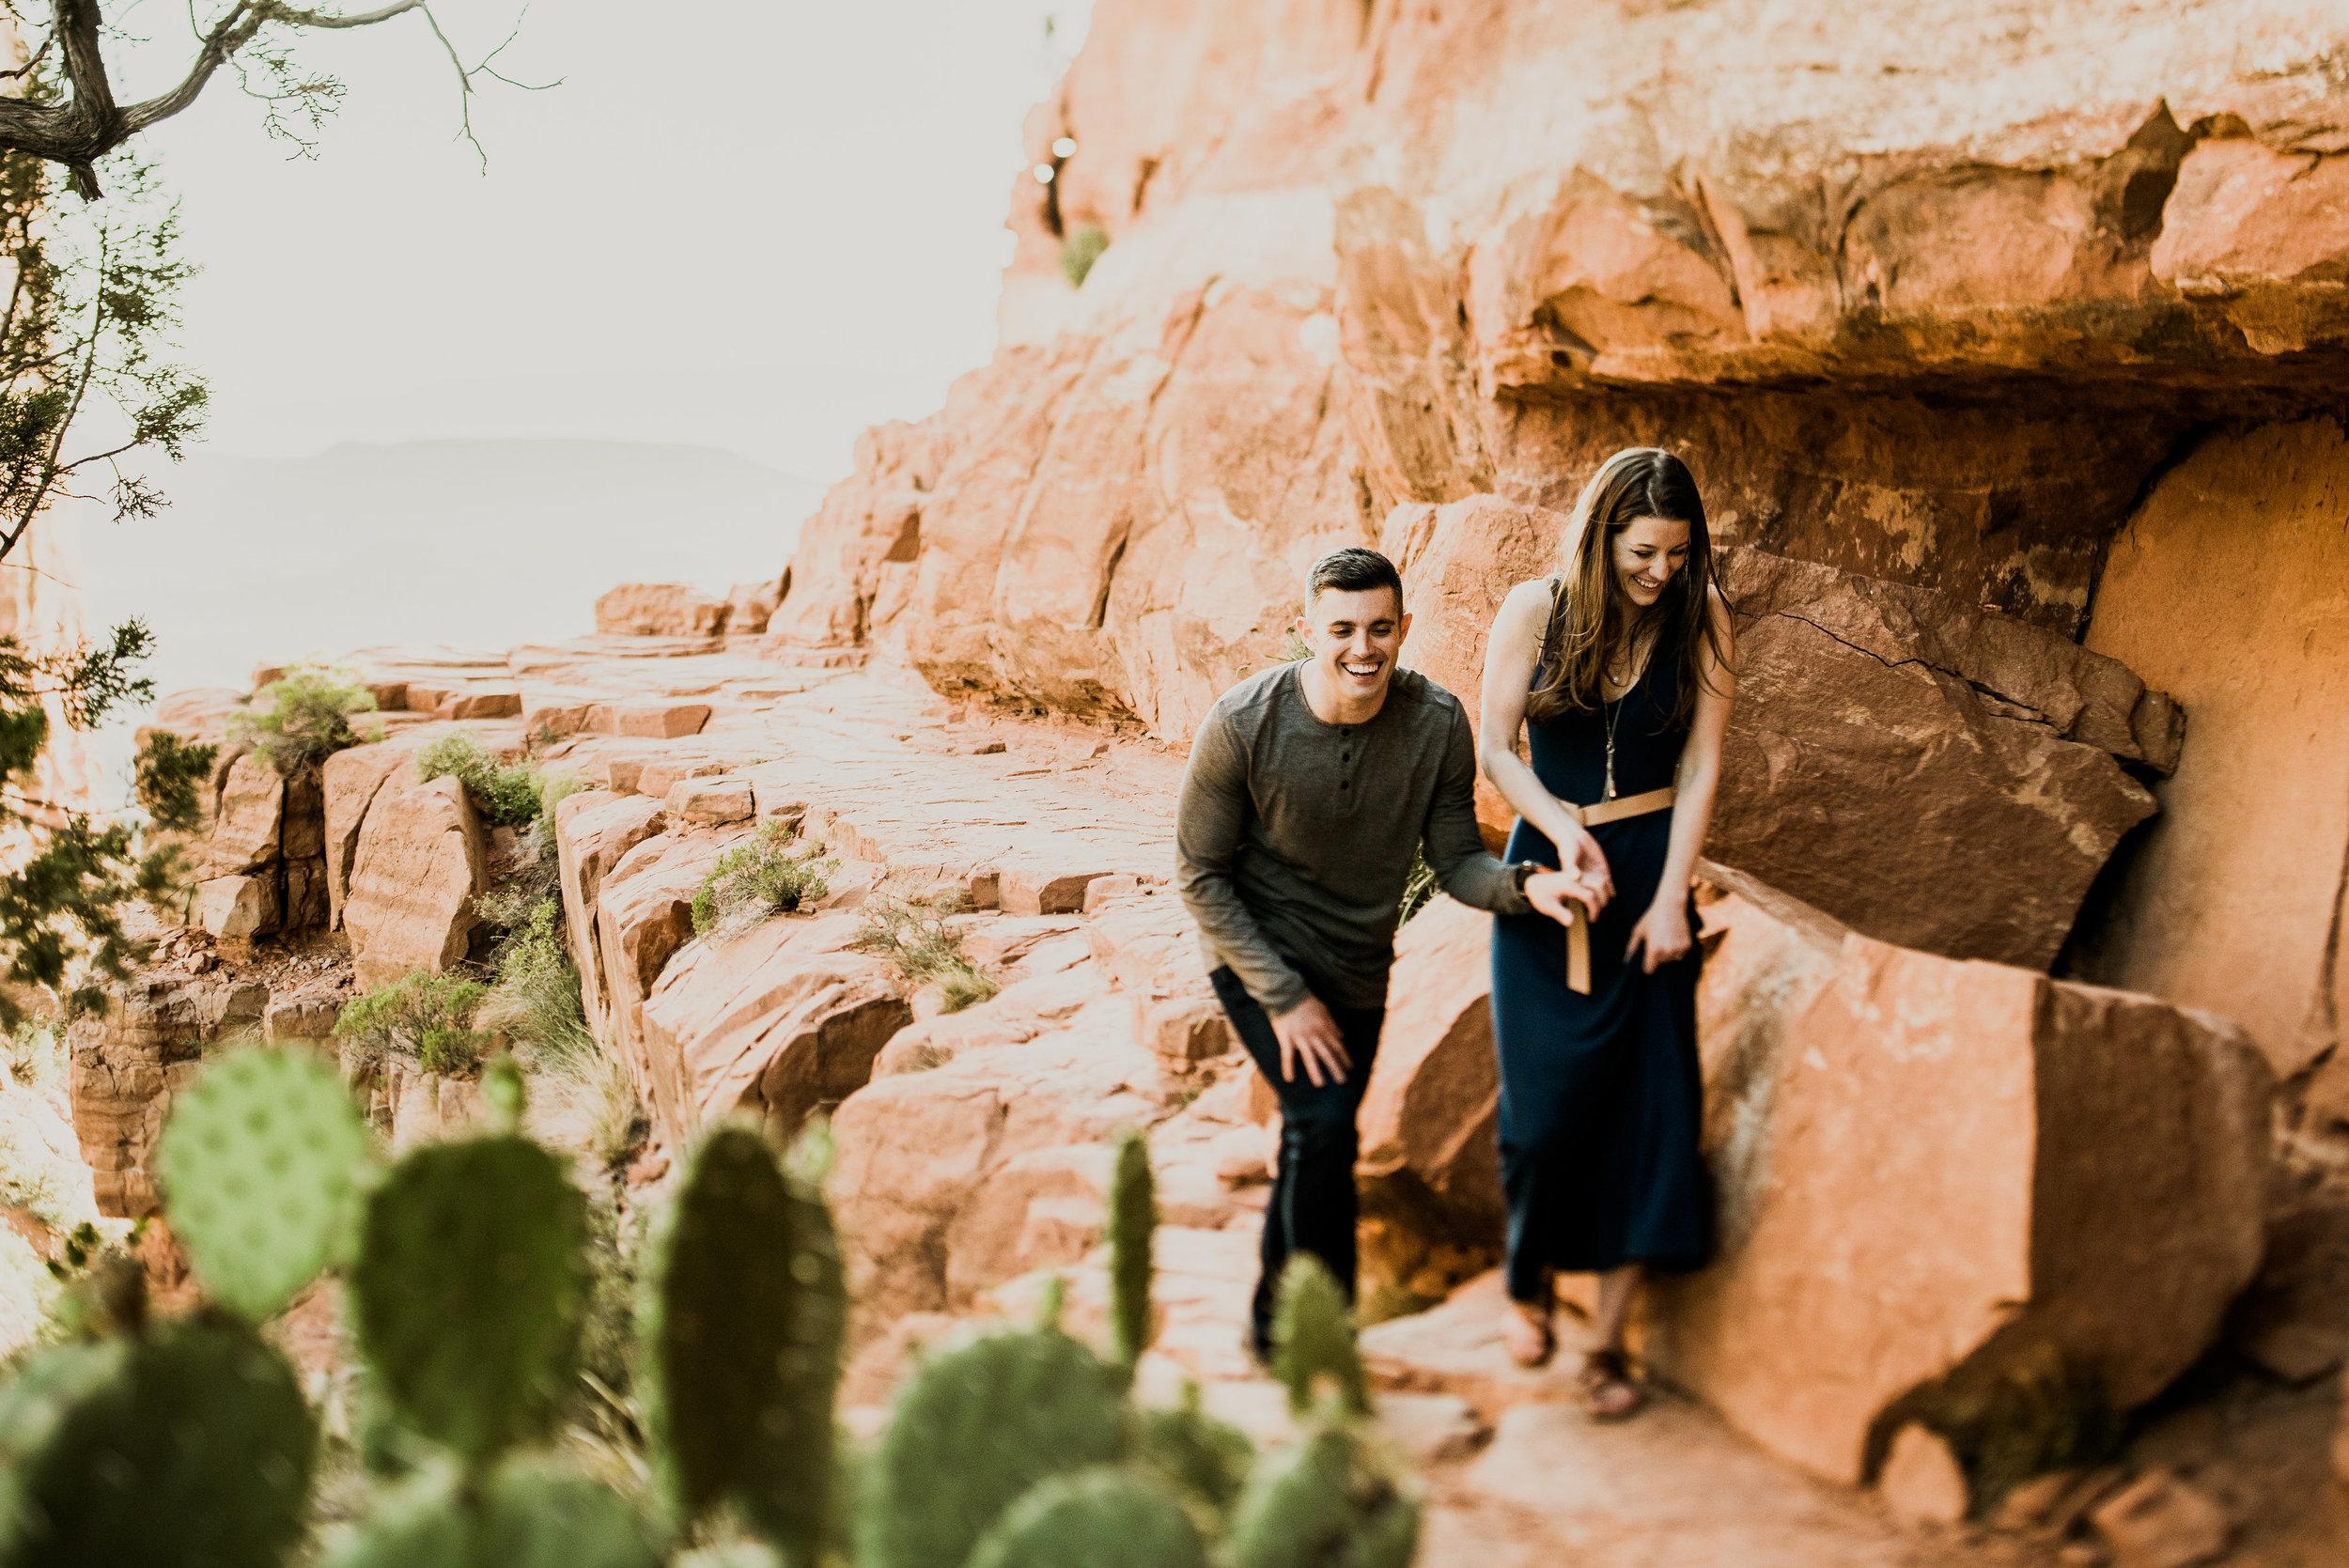 Isaiah-&-Taylor-Photography---Paul-&-Karen-Engagement,-Sedona-Arizona-121.jpg